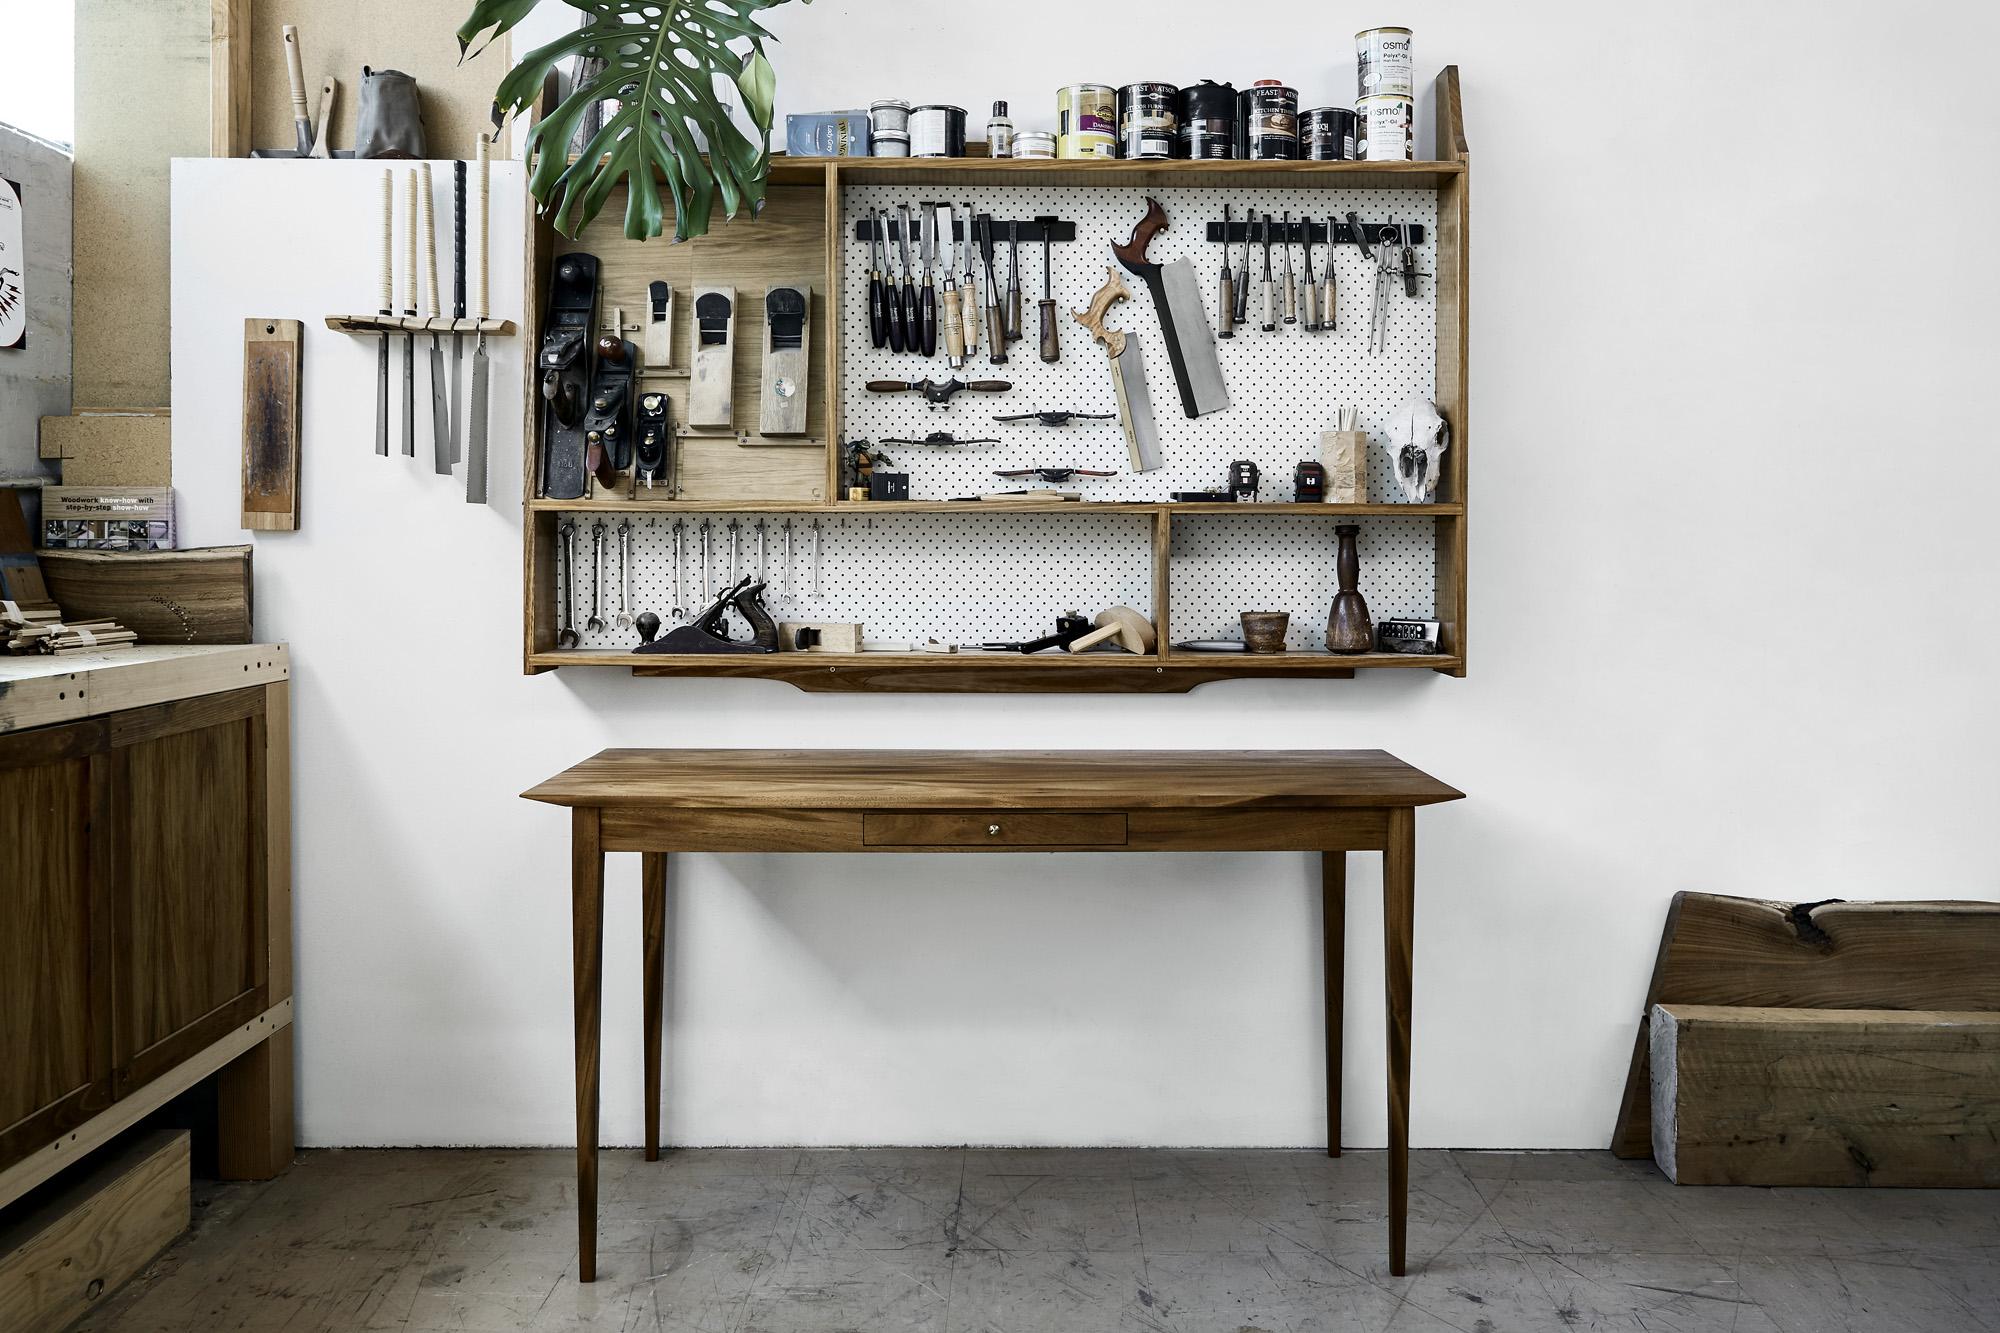 Dan Barker of Bricolage - Feature Interview - Brunswick, VIC, Australia - Australian Design & Woodworking - Image 3